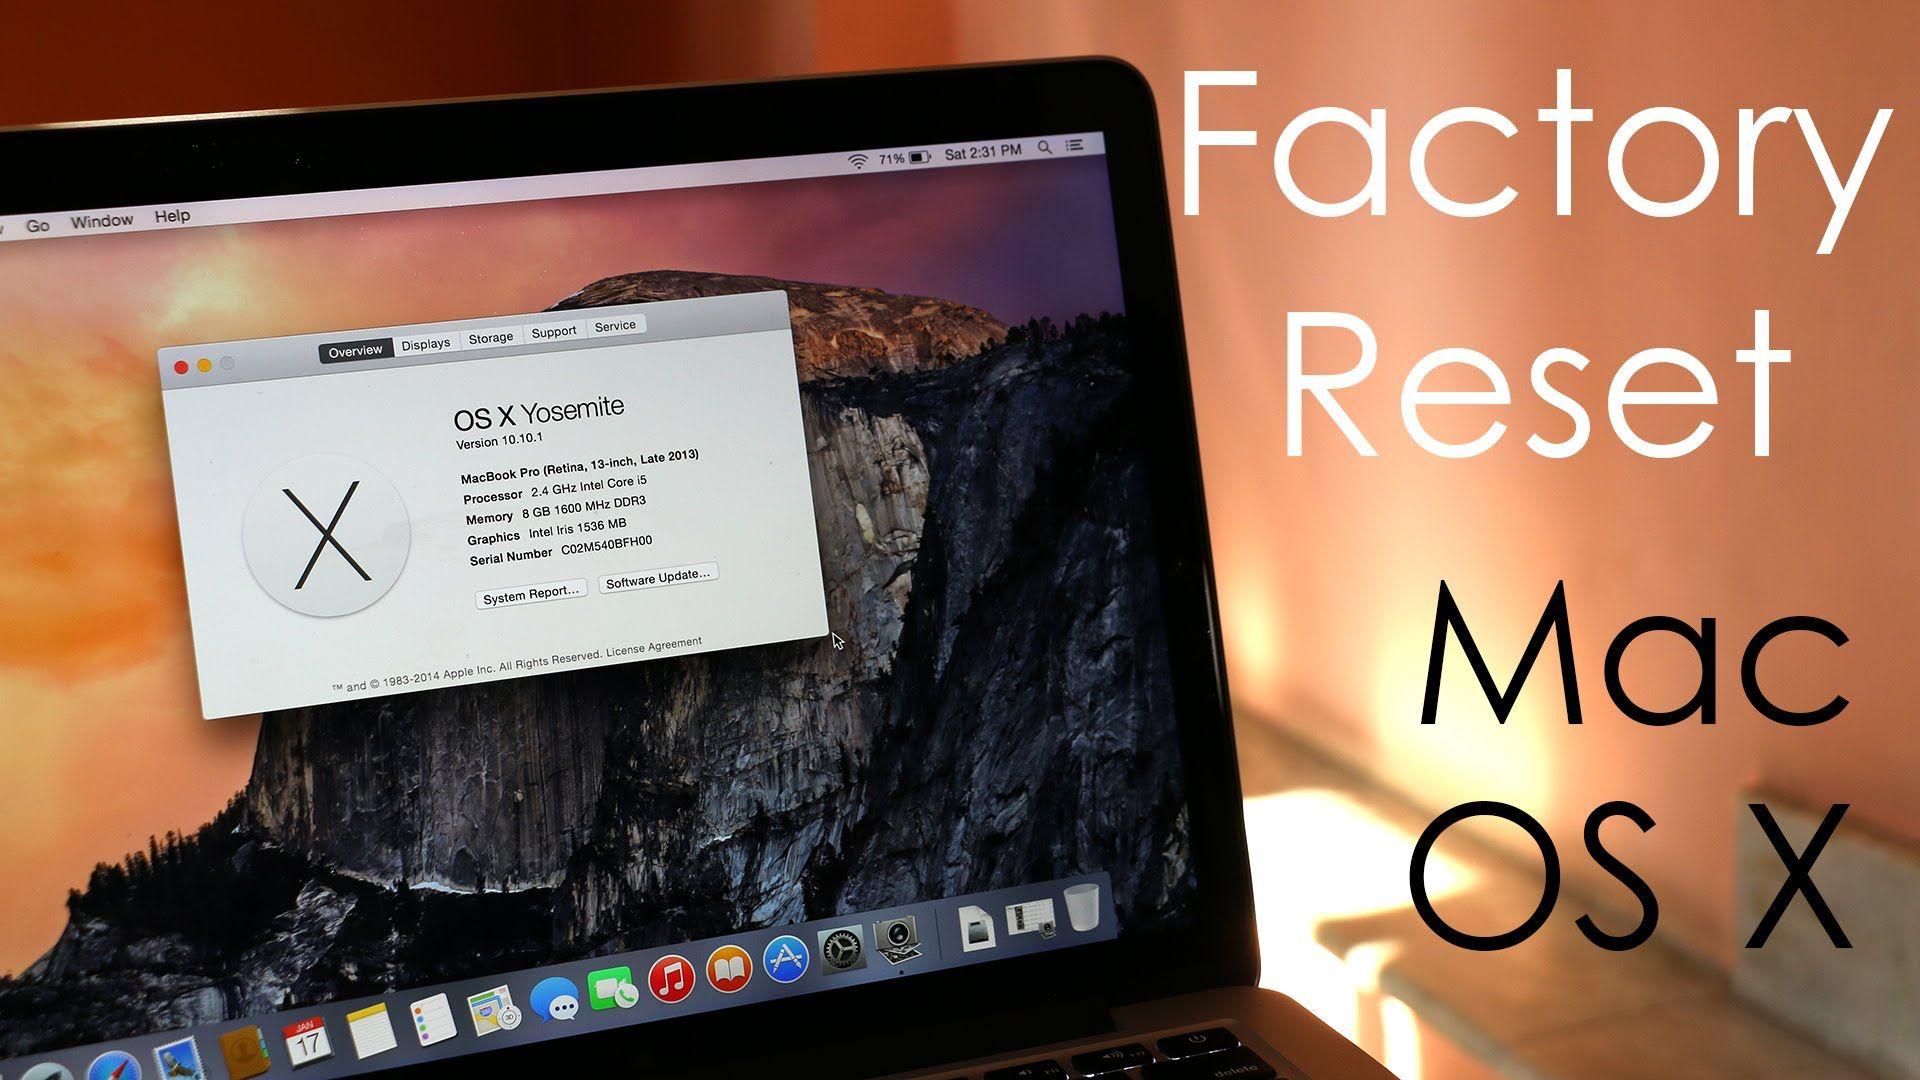 How To Factory Reset Hard Reset Your Macbook Os X Yosemite Osx Yosemite Mac Mini Macbook